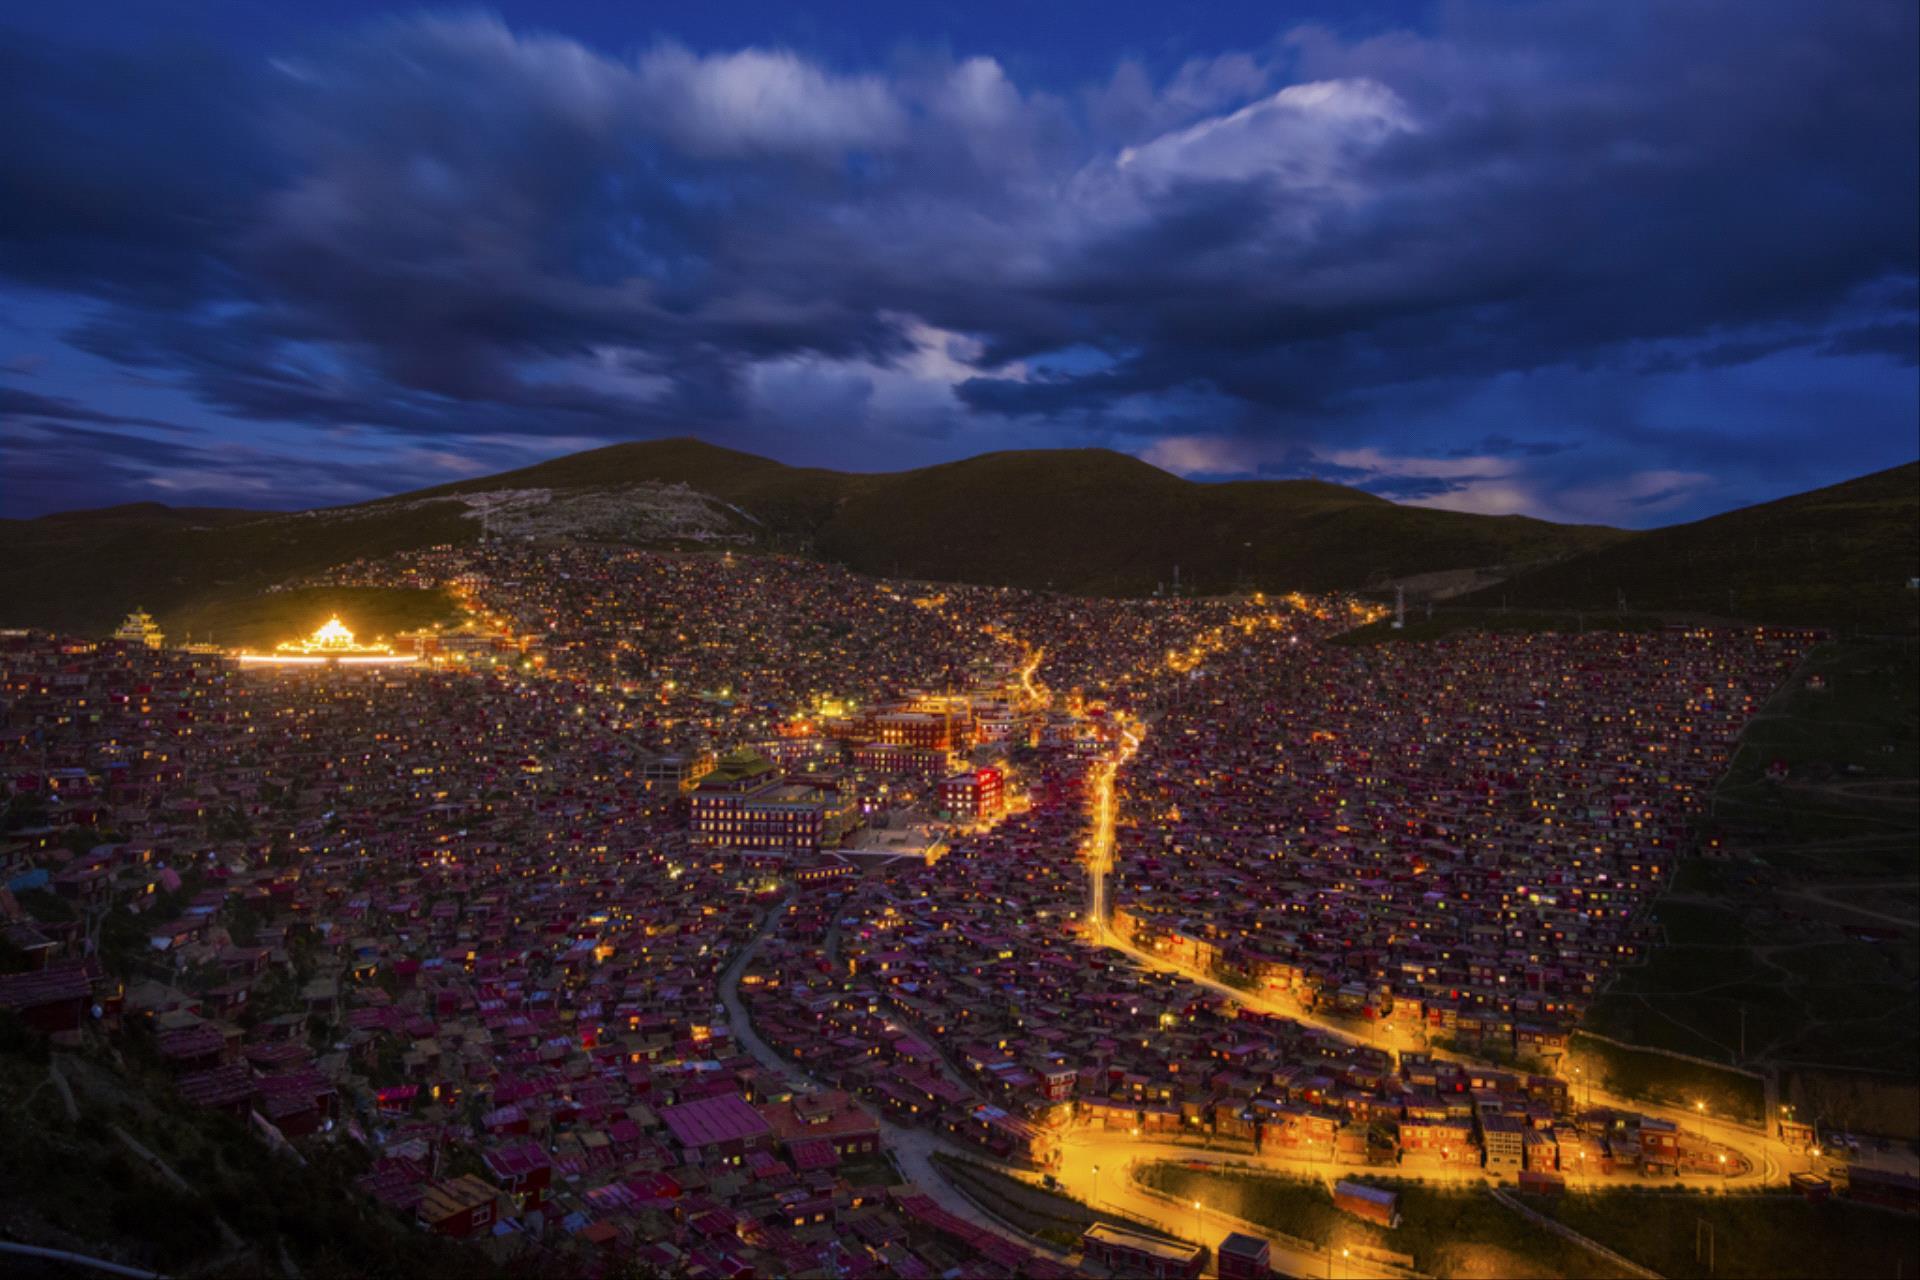 PhotoVivo Honor Mention - Yuebin Chen (China)  Myriad Lights